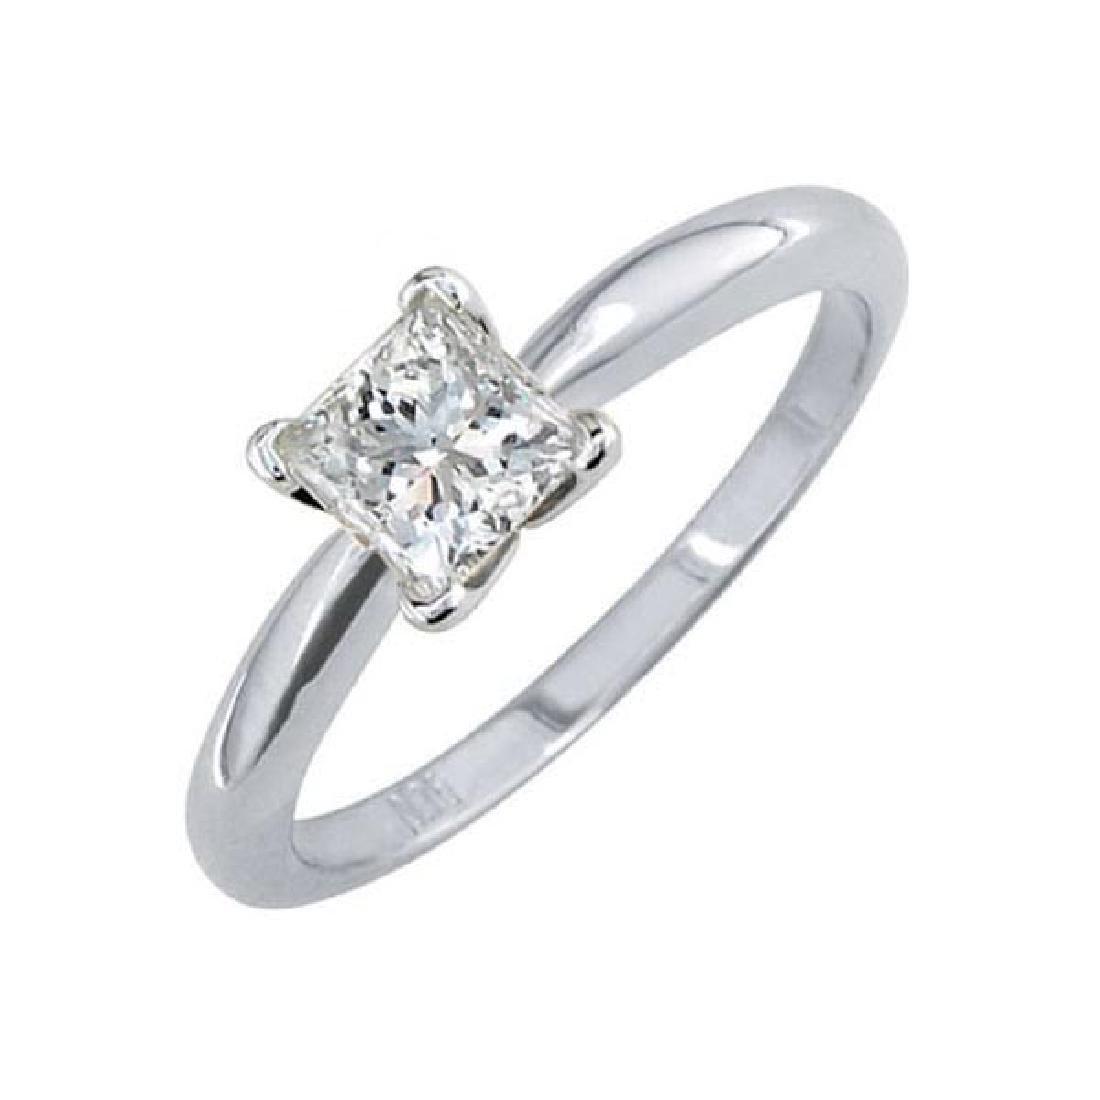 Certified 1.21 CTW Princess Diamond Solitaire 14k Ring